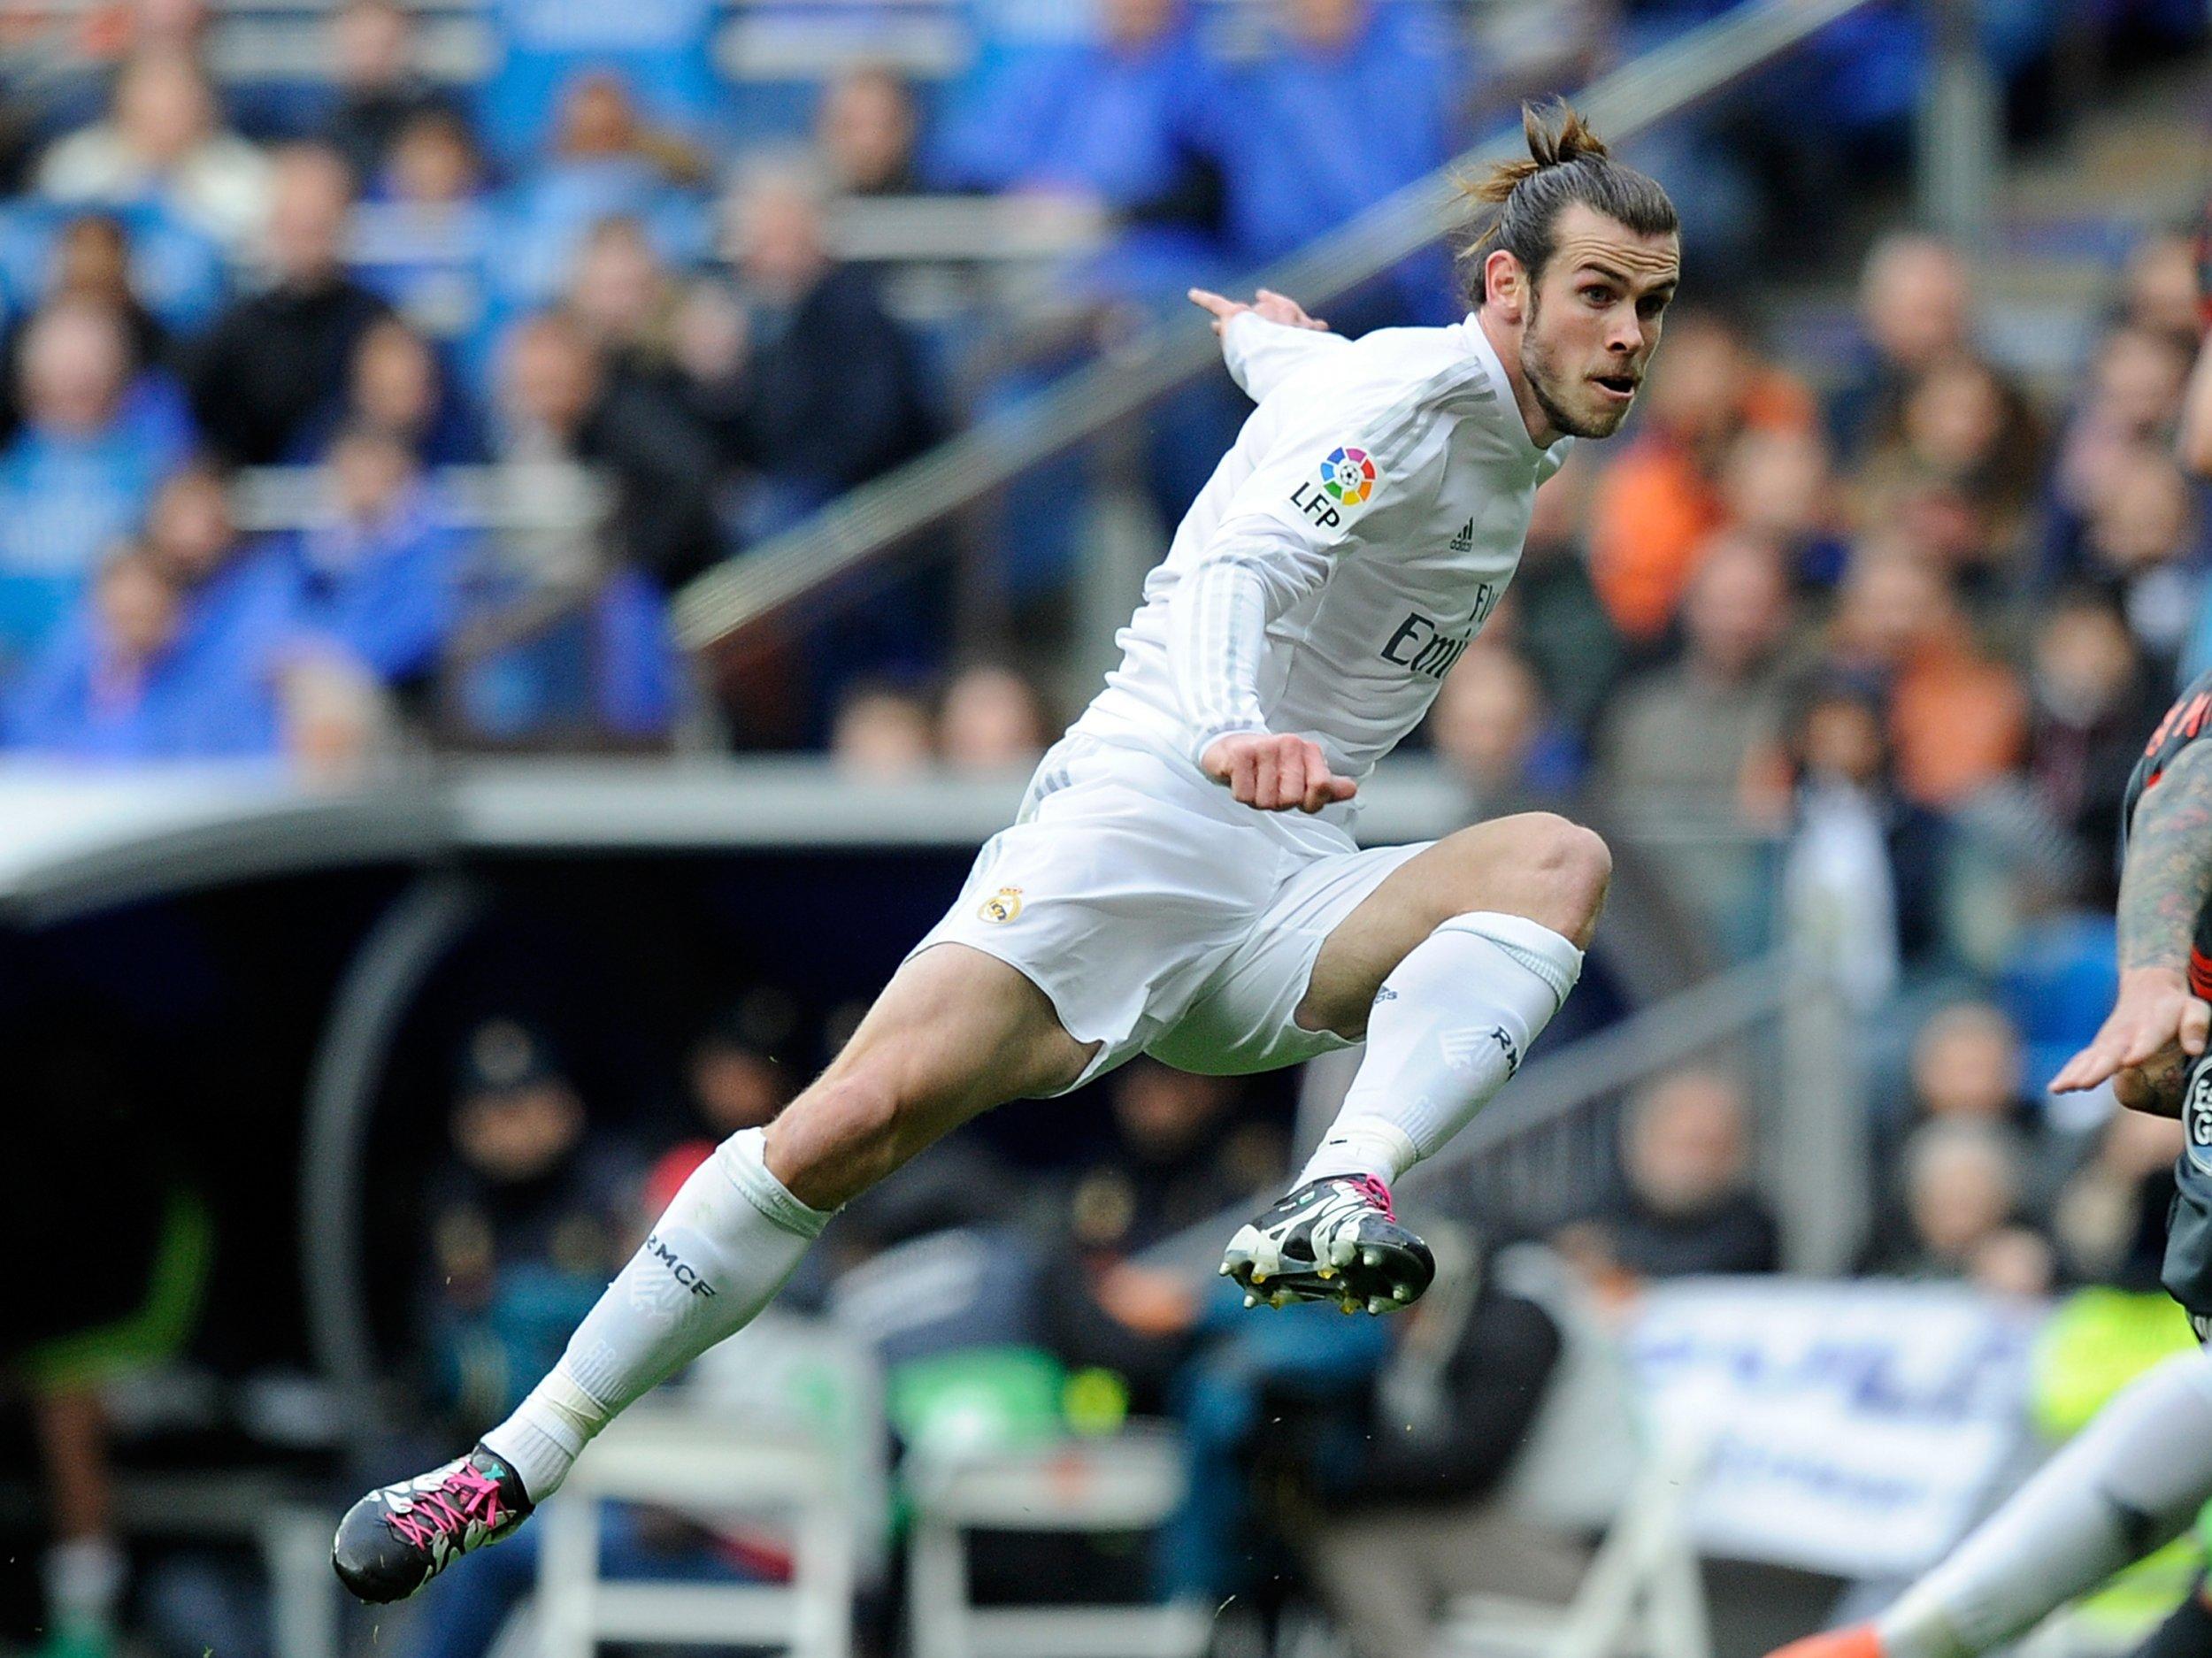 Gareth Bale has enjoyed a superb season for Real Madrid.